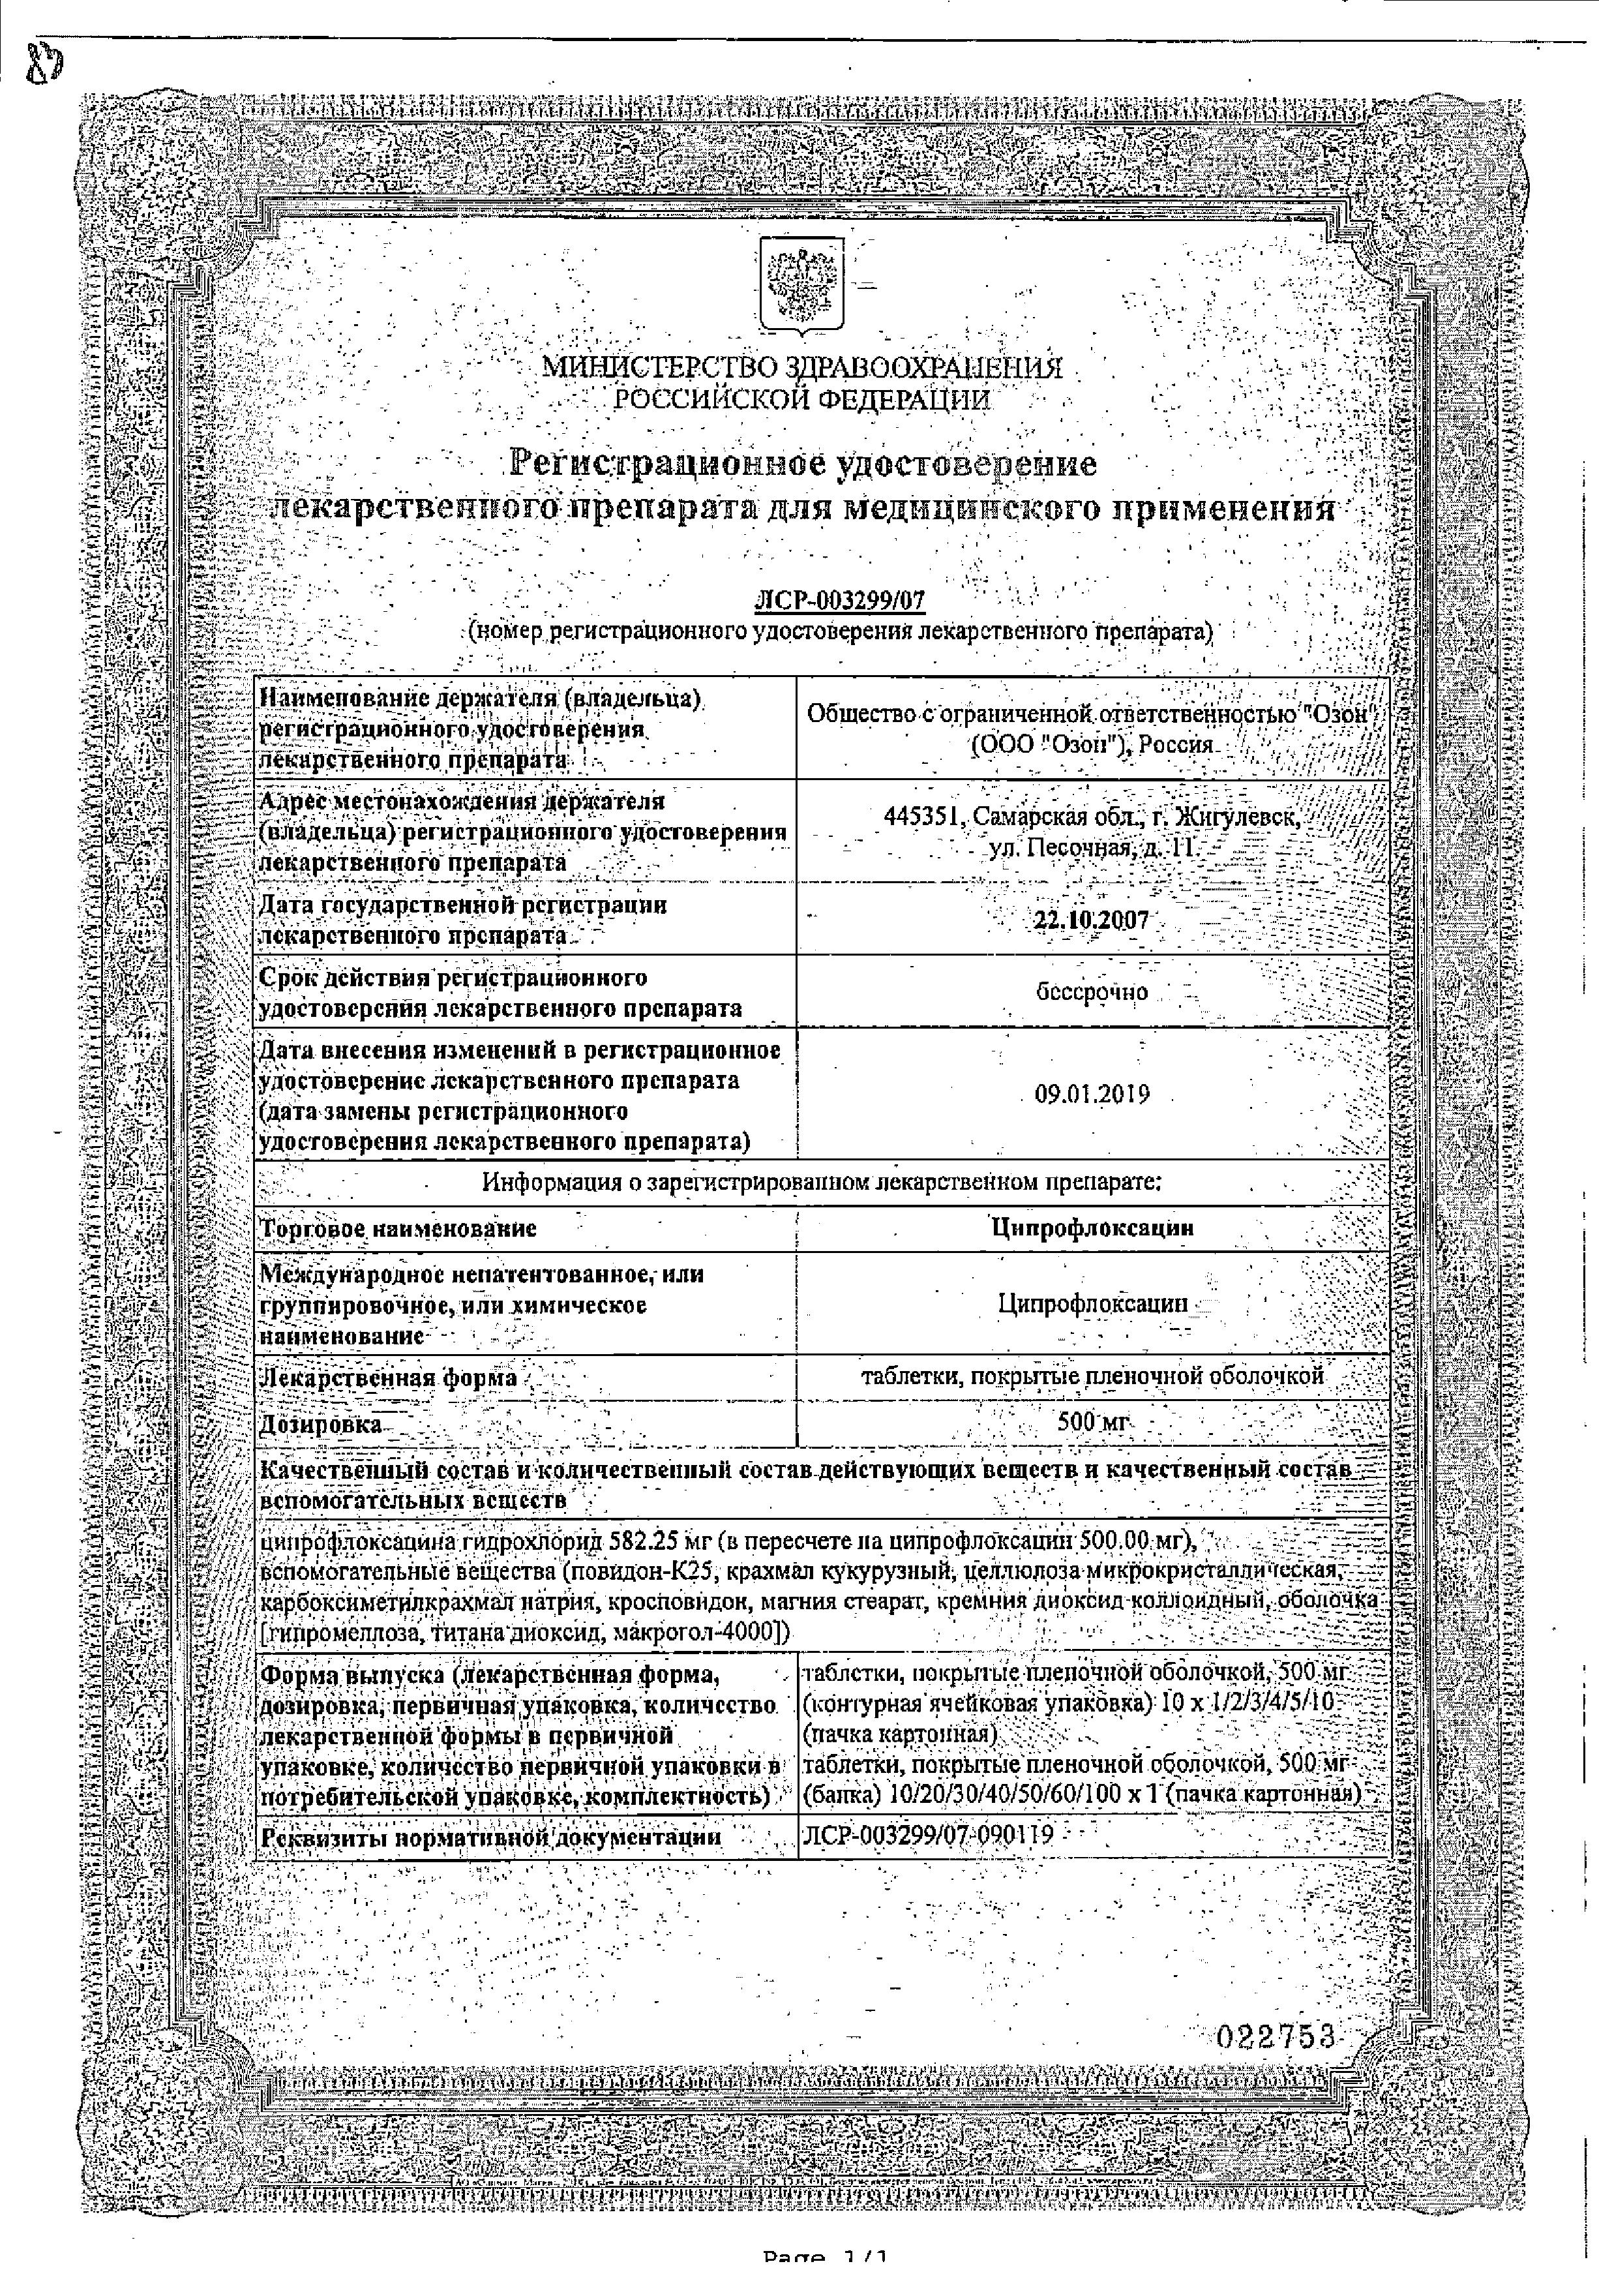 Ципрофлоксацин сертификат